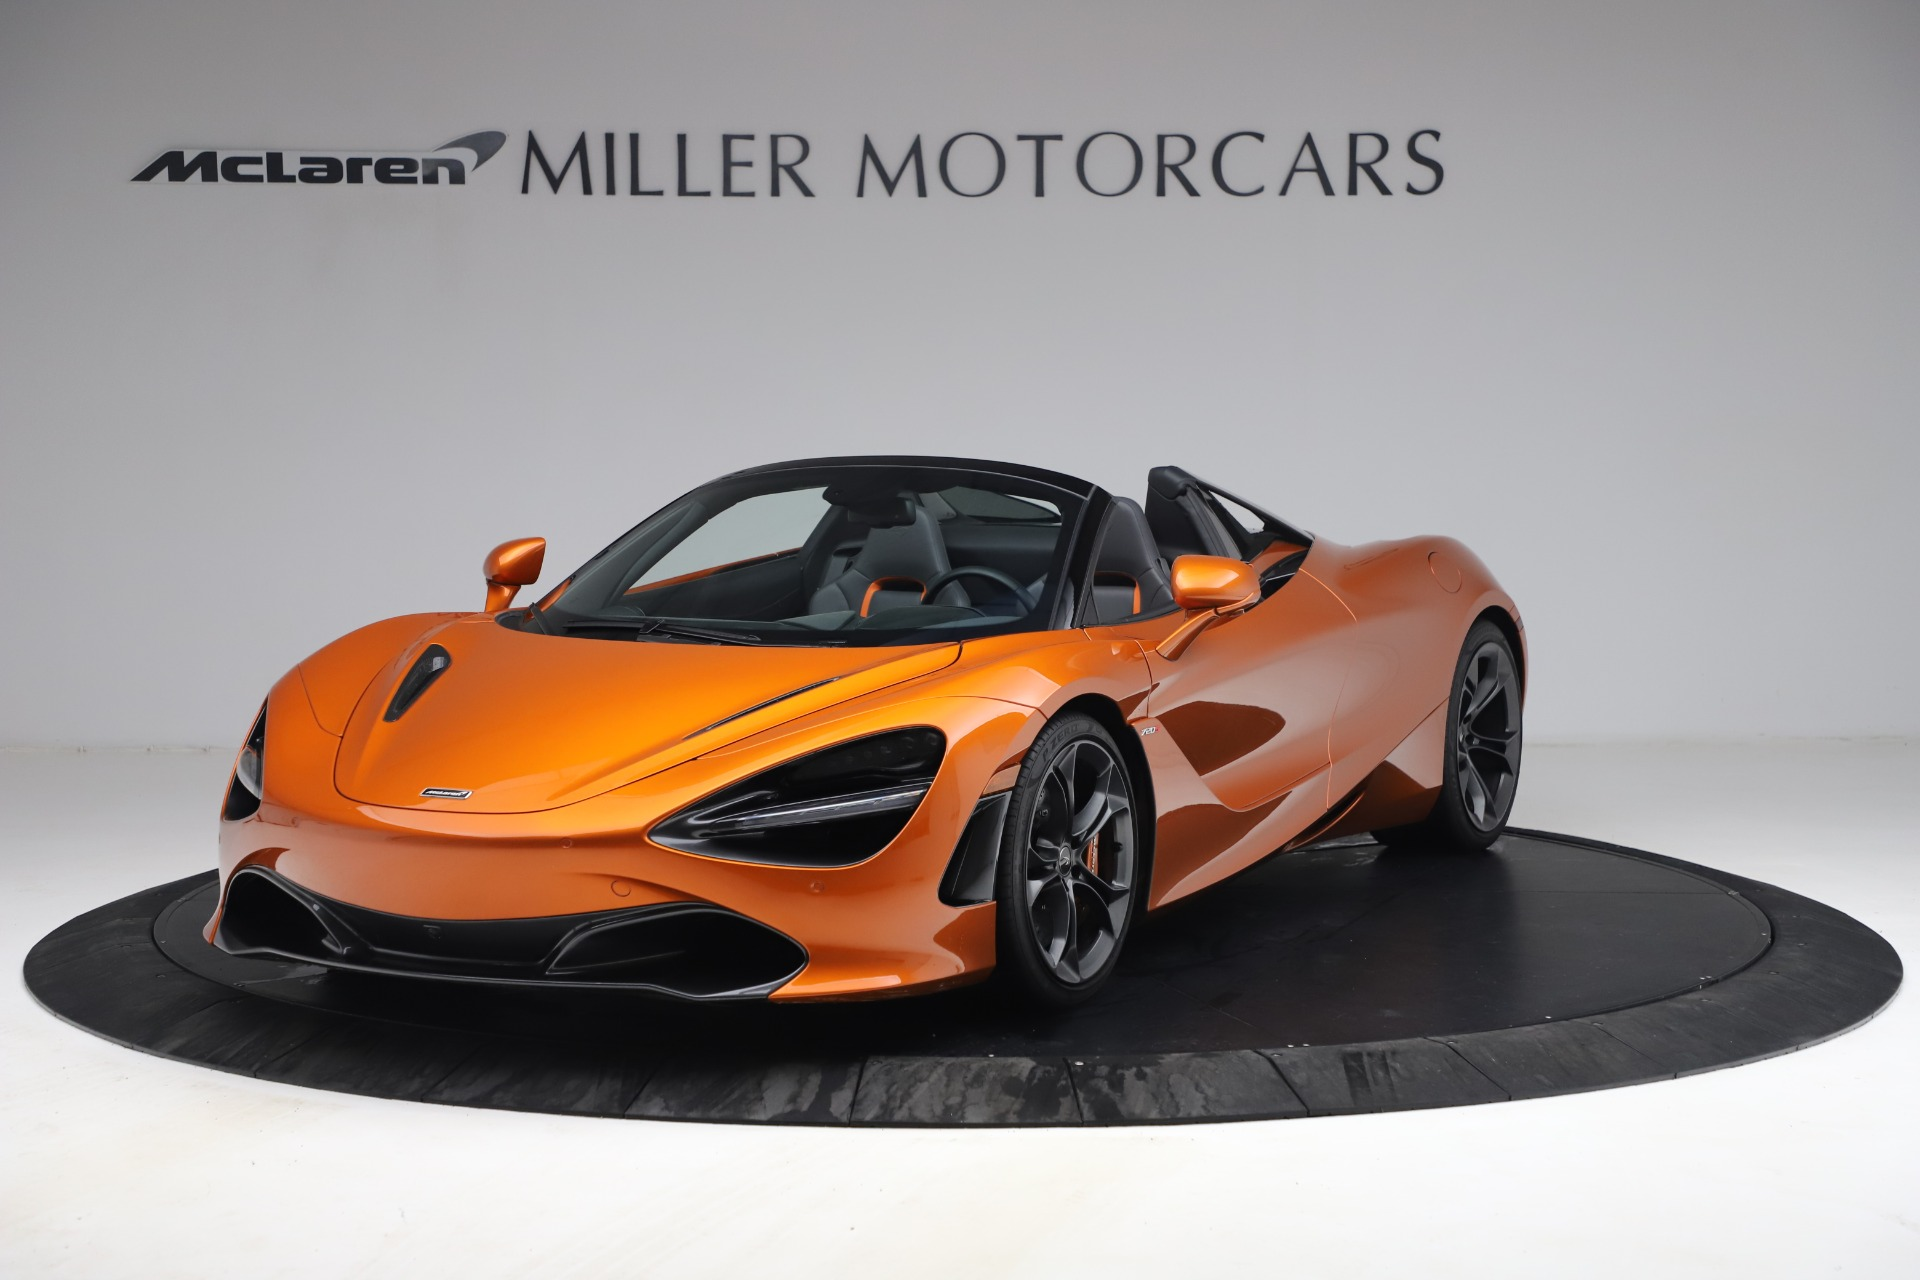 Used 2020 McLaren 720S Spider for sale $335,900 at McLaren Greenwich in Greenwich CT 06830 1